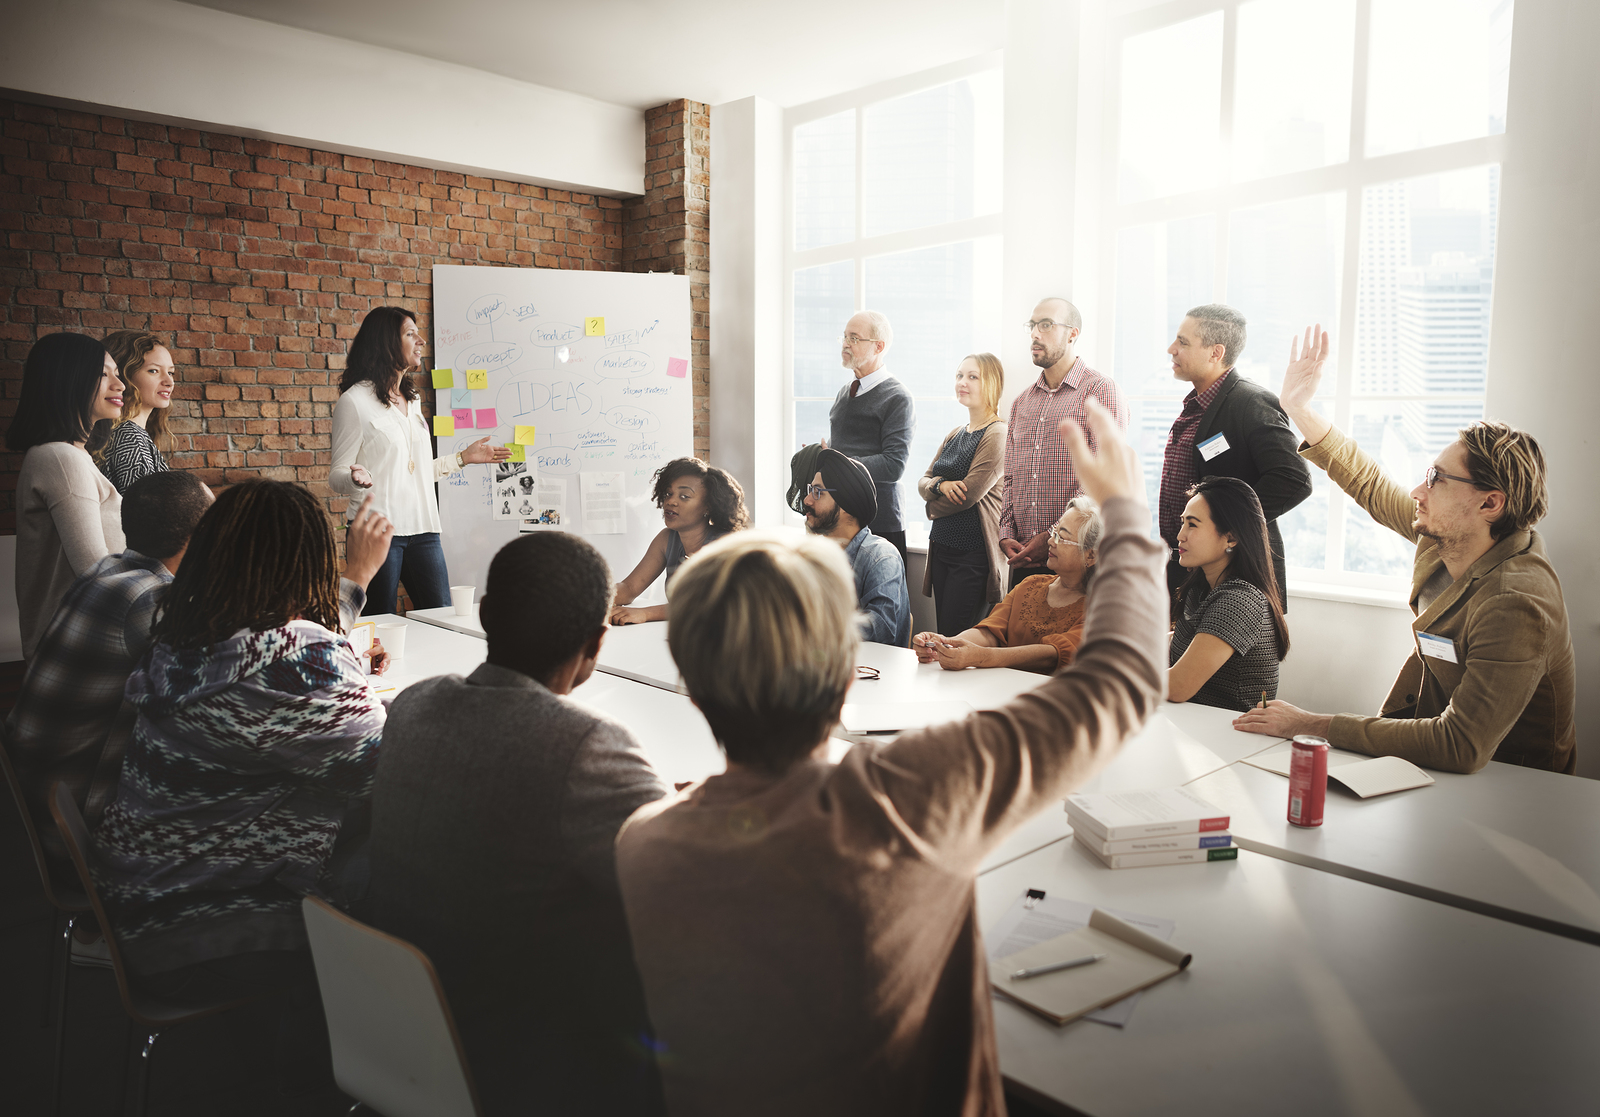 Group of professionals attending a leadership development workshop.